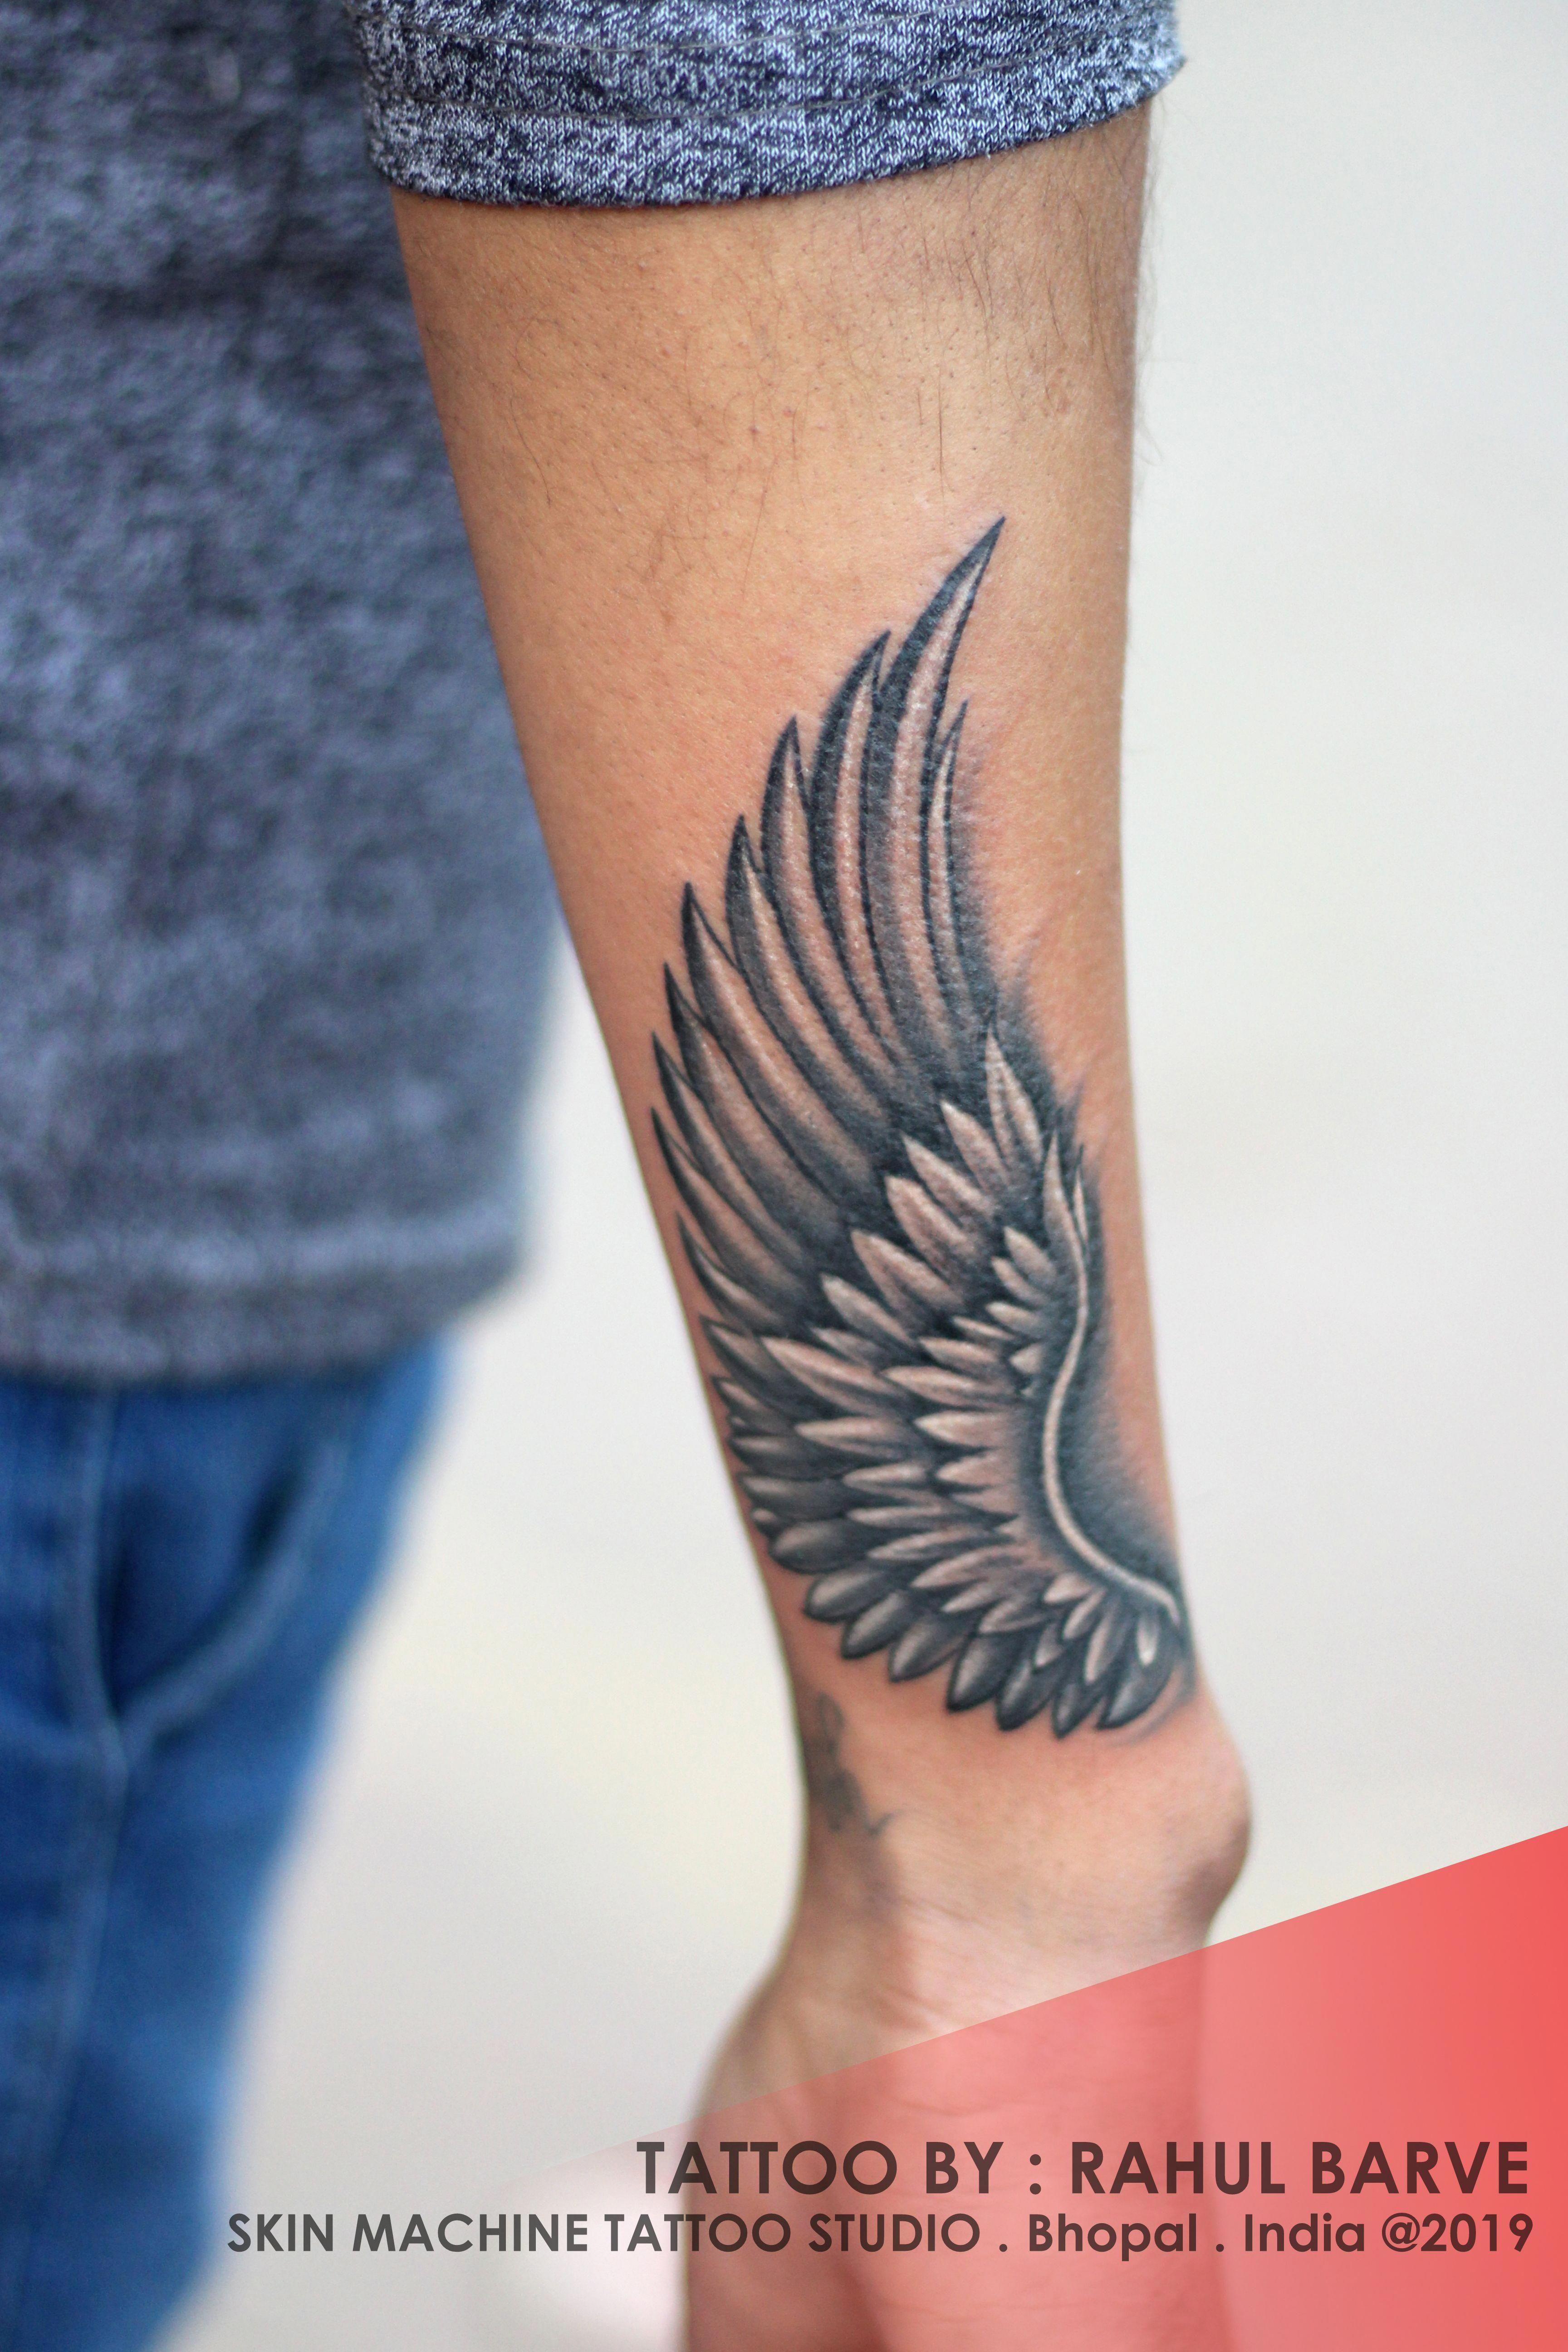 Sleeve Tattoo sleevetattoobigmen Tattoos for guys